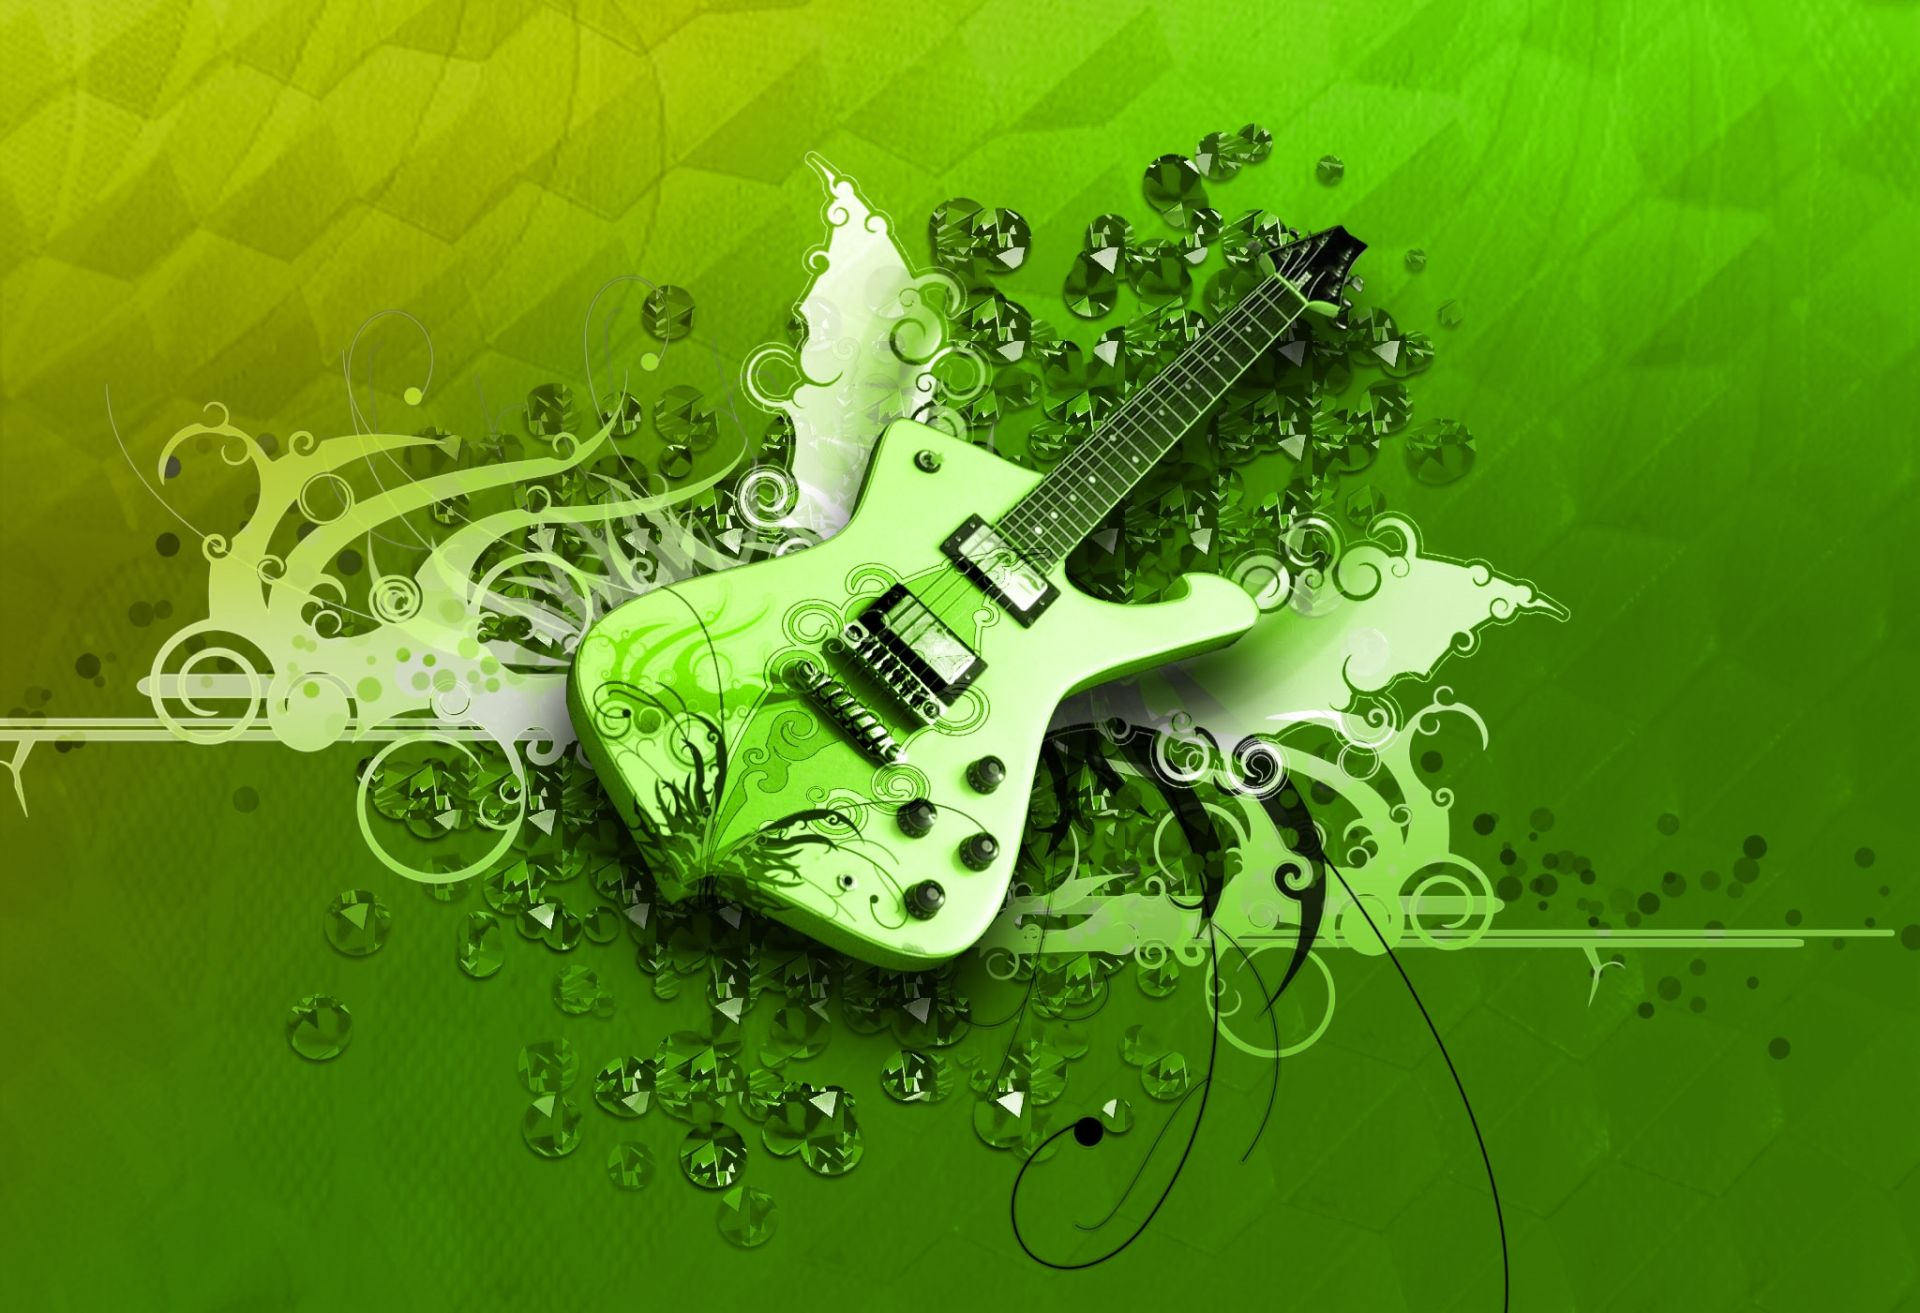 Guitar Abstract, HD Wallpaper